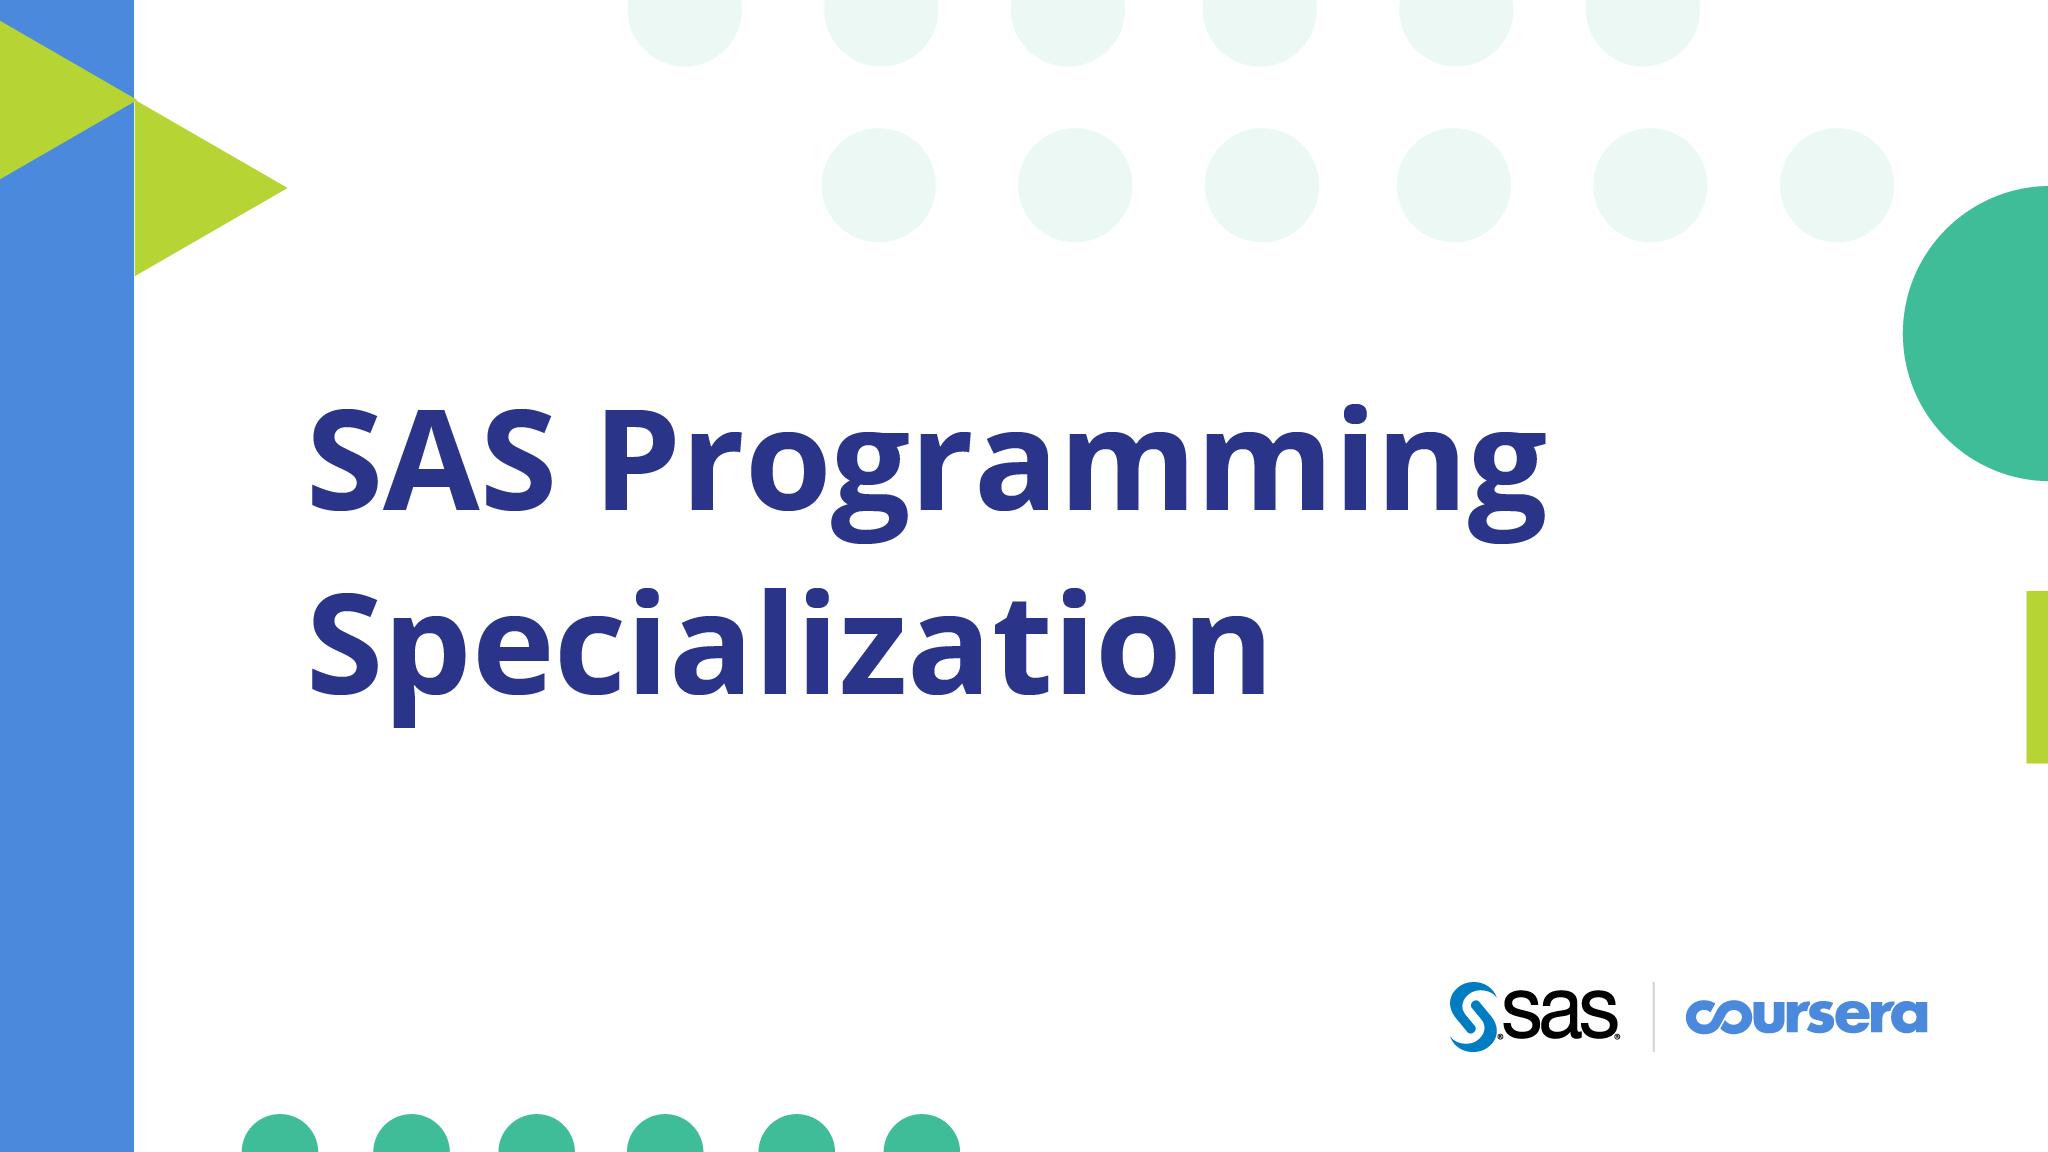 Coursera and SAS Bridge Analytics Skills Gap with New SAS® Programming Specialization